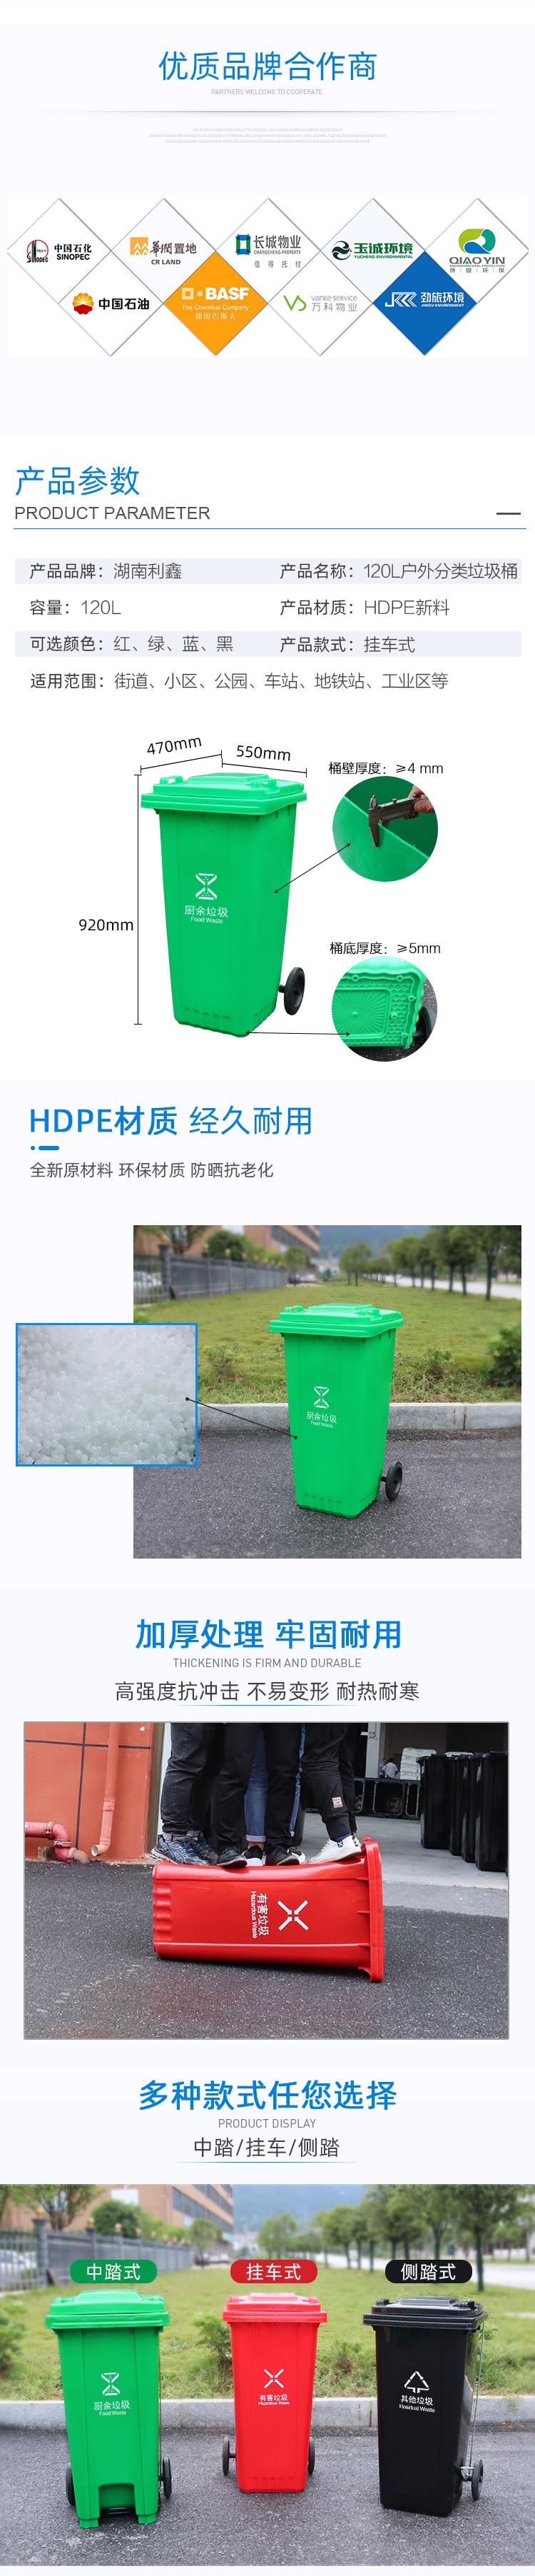 120L分类垃圾桶定制